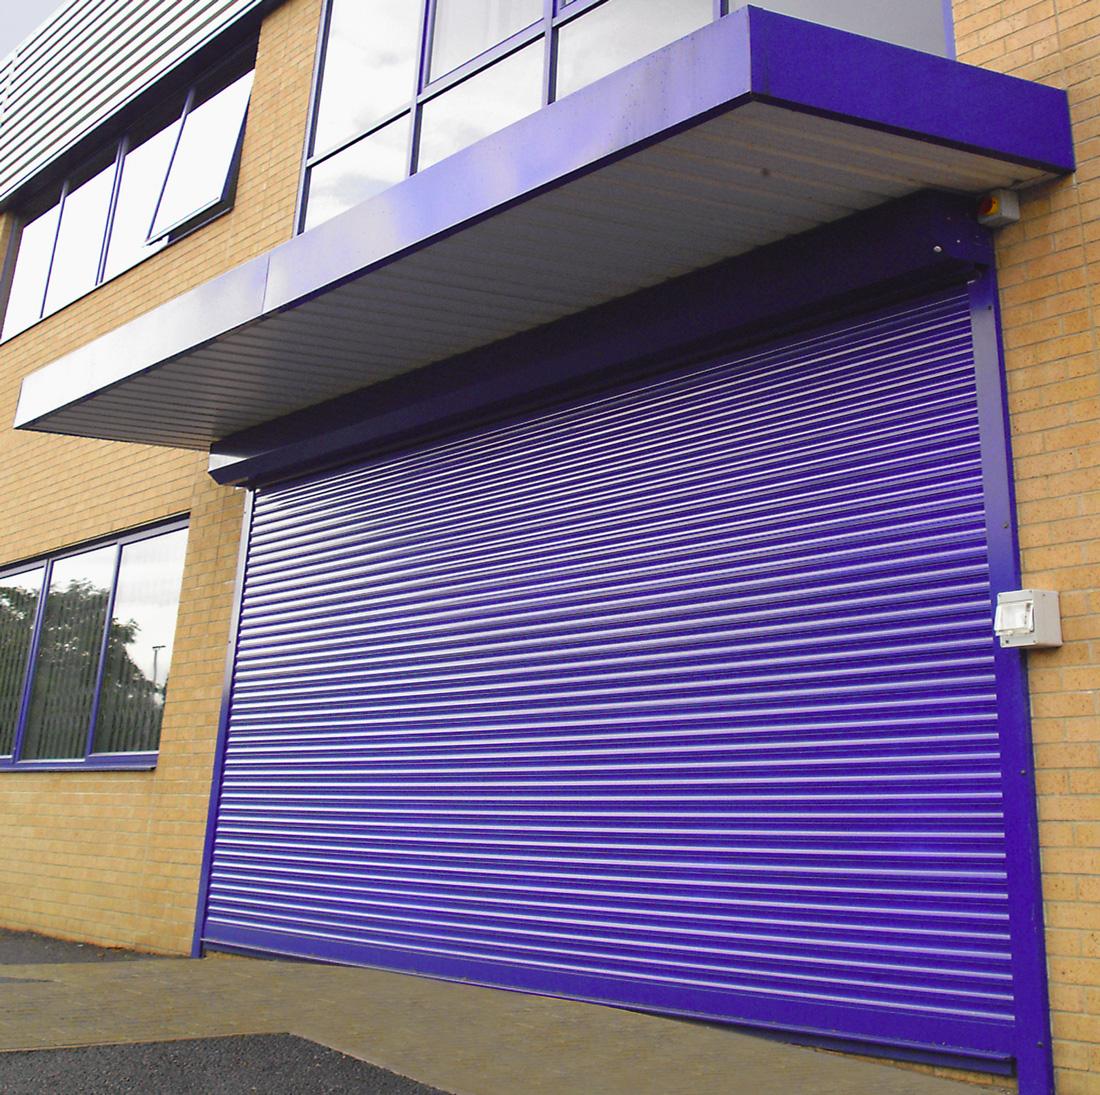 buy cheap roller shutters westwood security shutters ltd. Black Bedroom Furniture Sets. Home Design Ideas